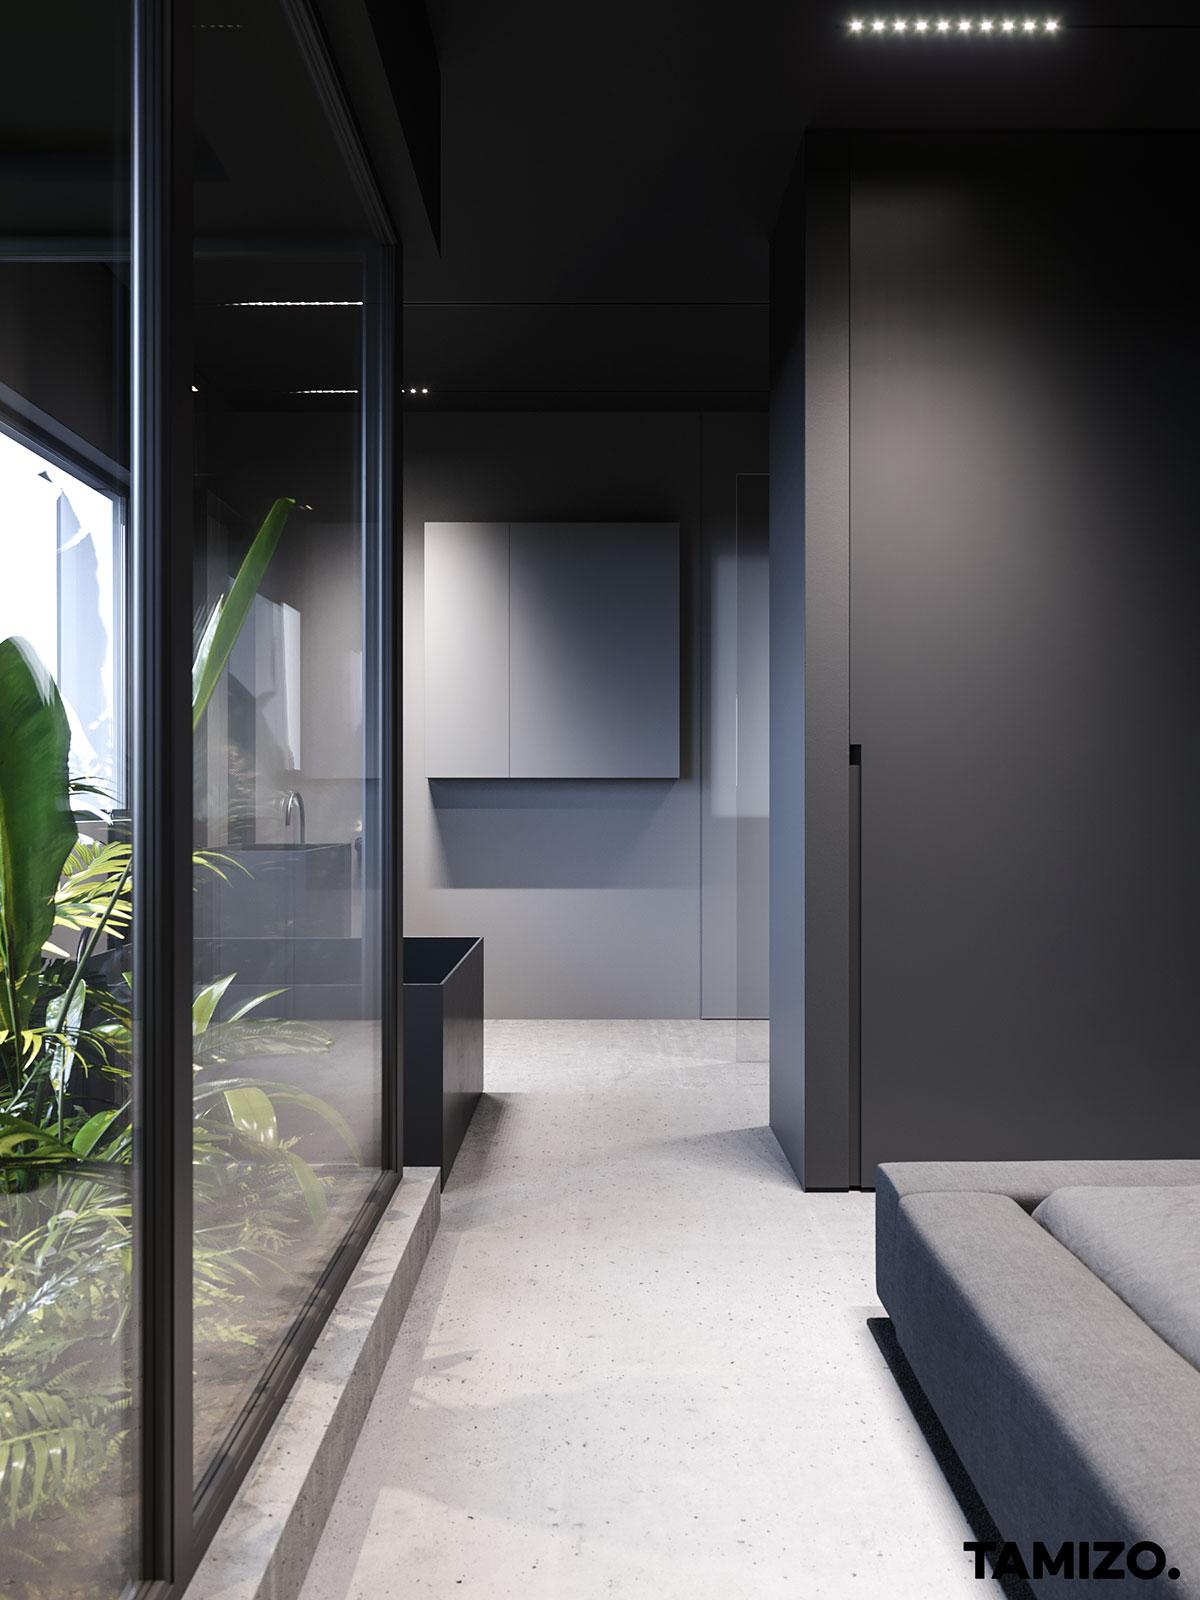 tamizo_architects_mateusz_kuo_stolarski_poznan_iterior_design_apartment_penthouse_11